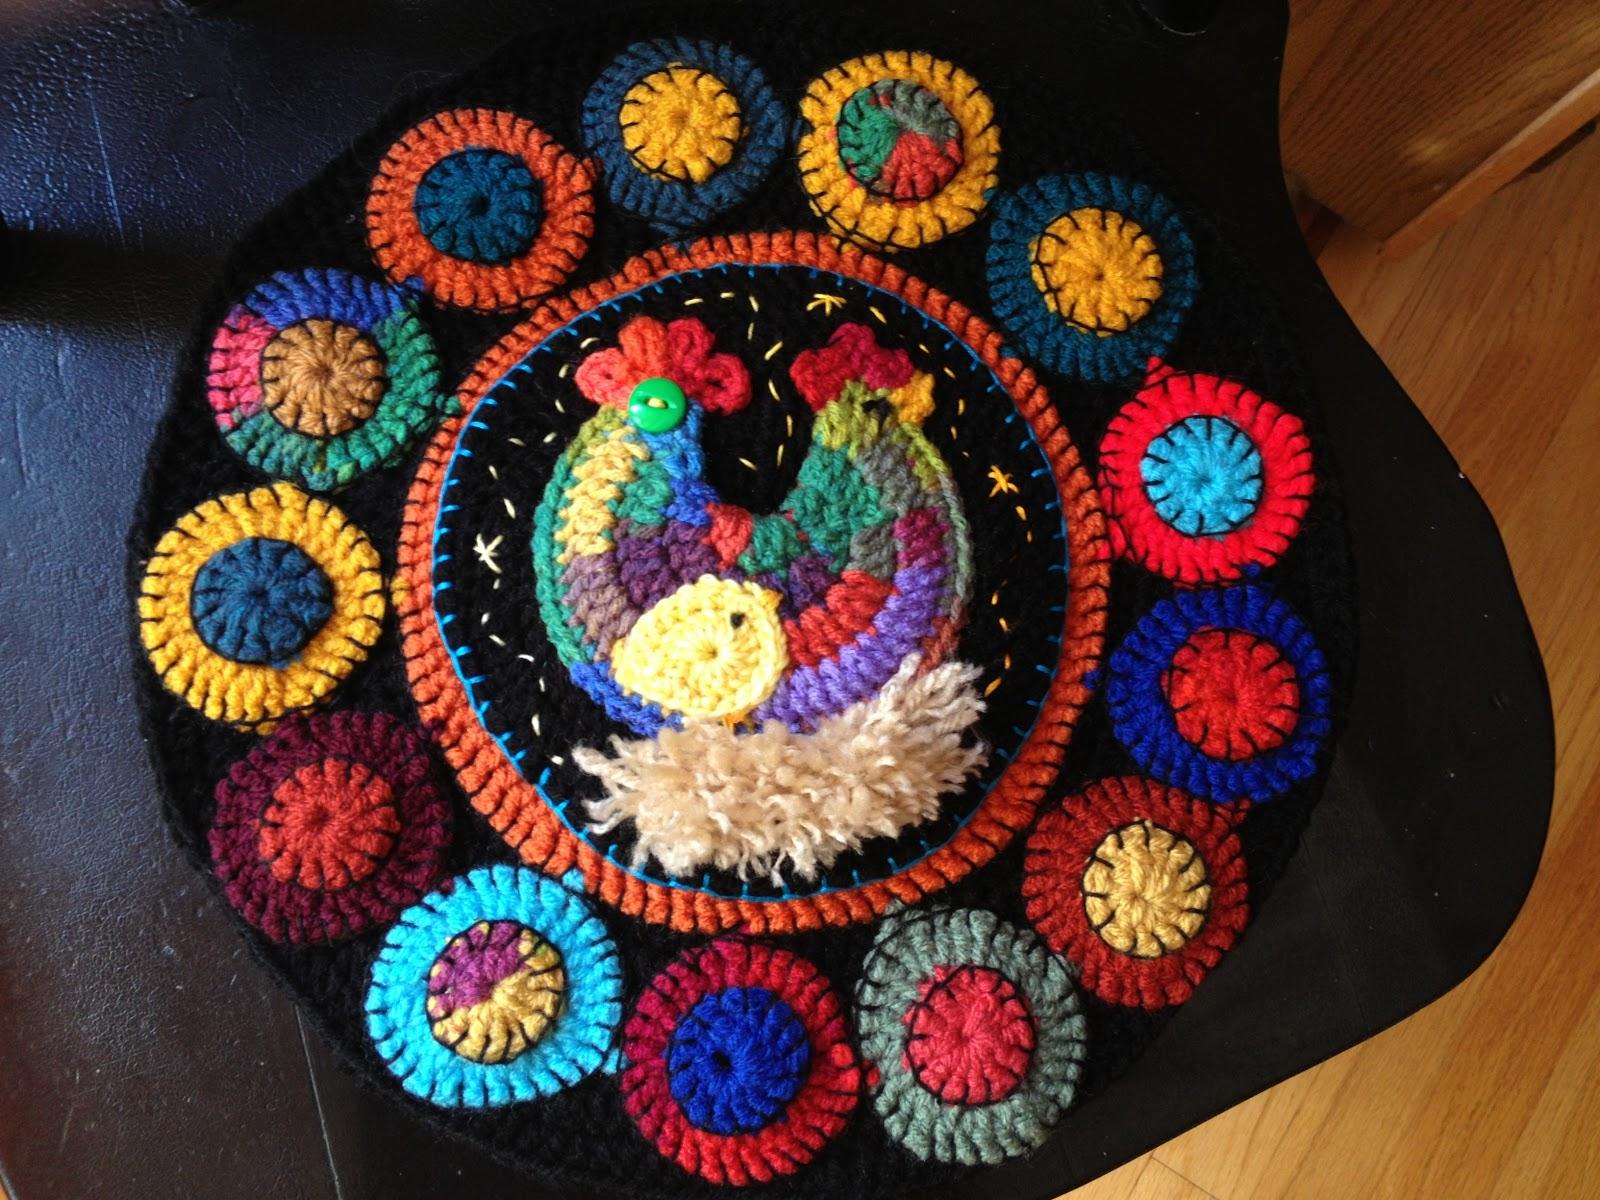 Fiddlesticks - My crochet and knitting ramblings.: Crochet Chicken ...